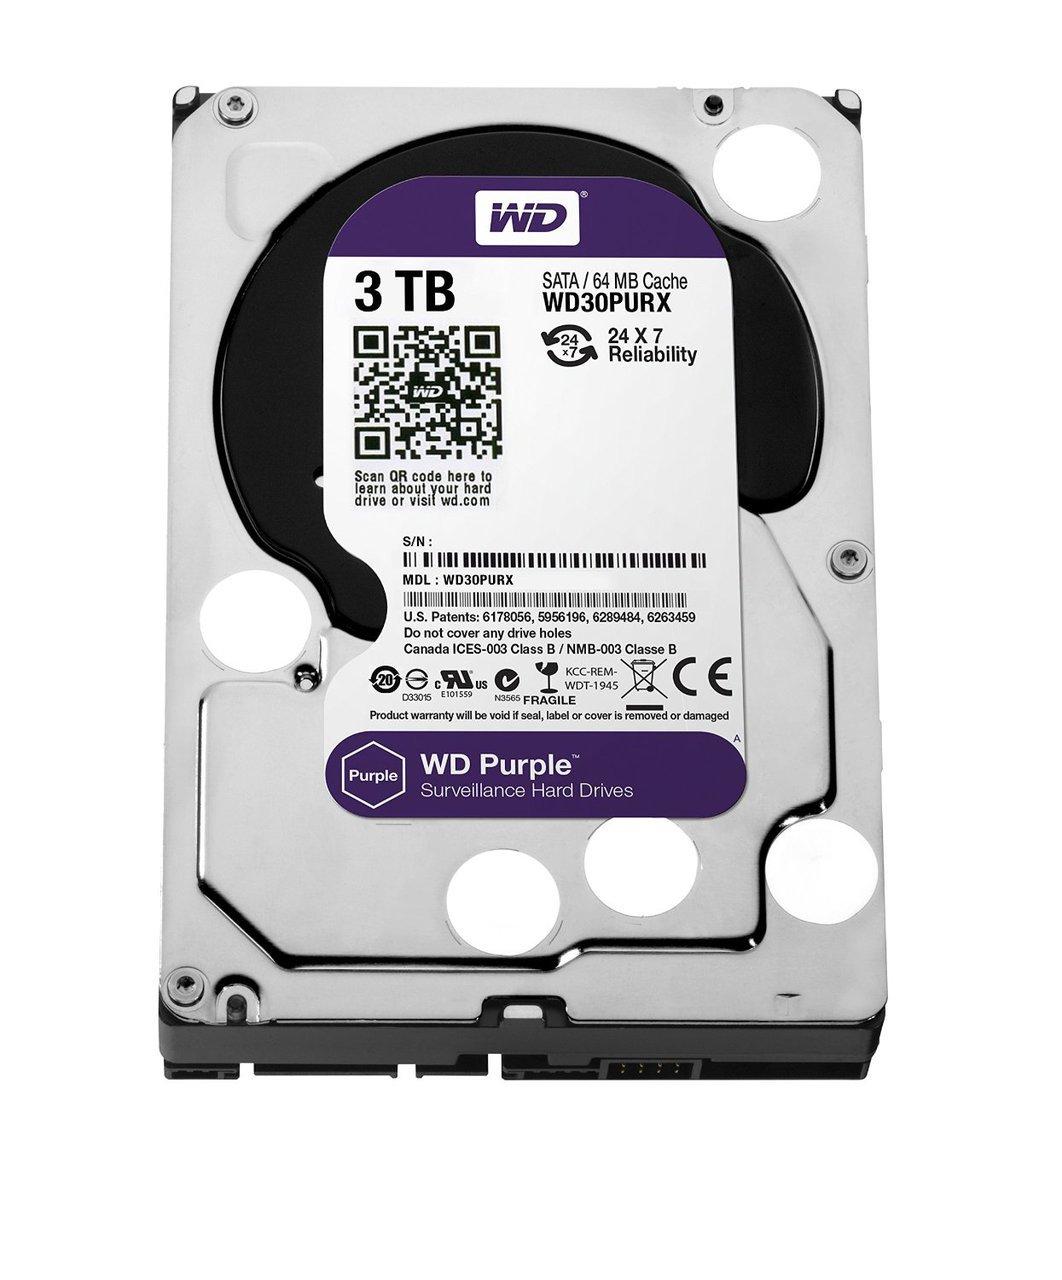 WD Purple 3TB Surveillence Hard Drive: 1 to 8-bay: 3.5-inch, SATA 6 Gb/s, Intellipower, 64MB Cache WD30PURX